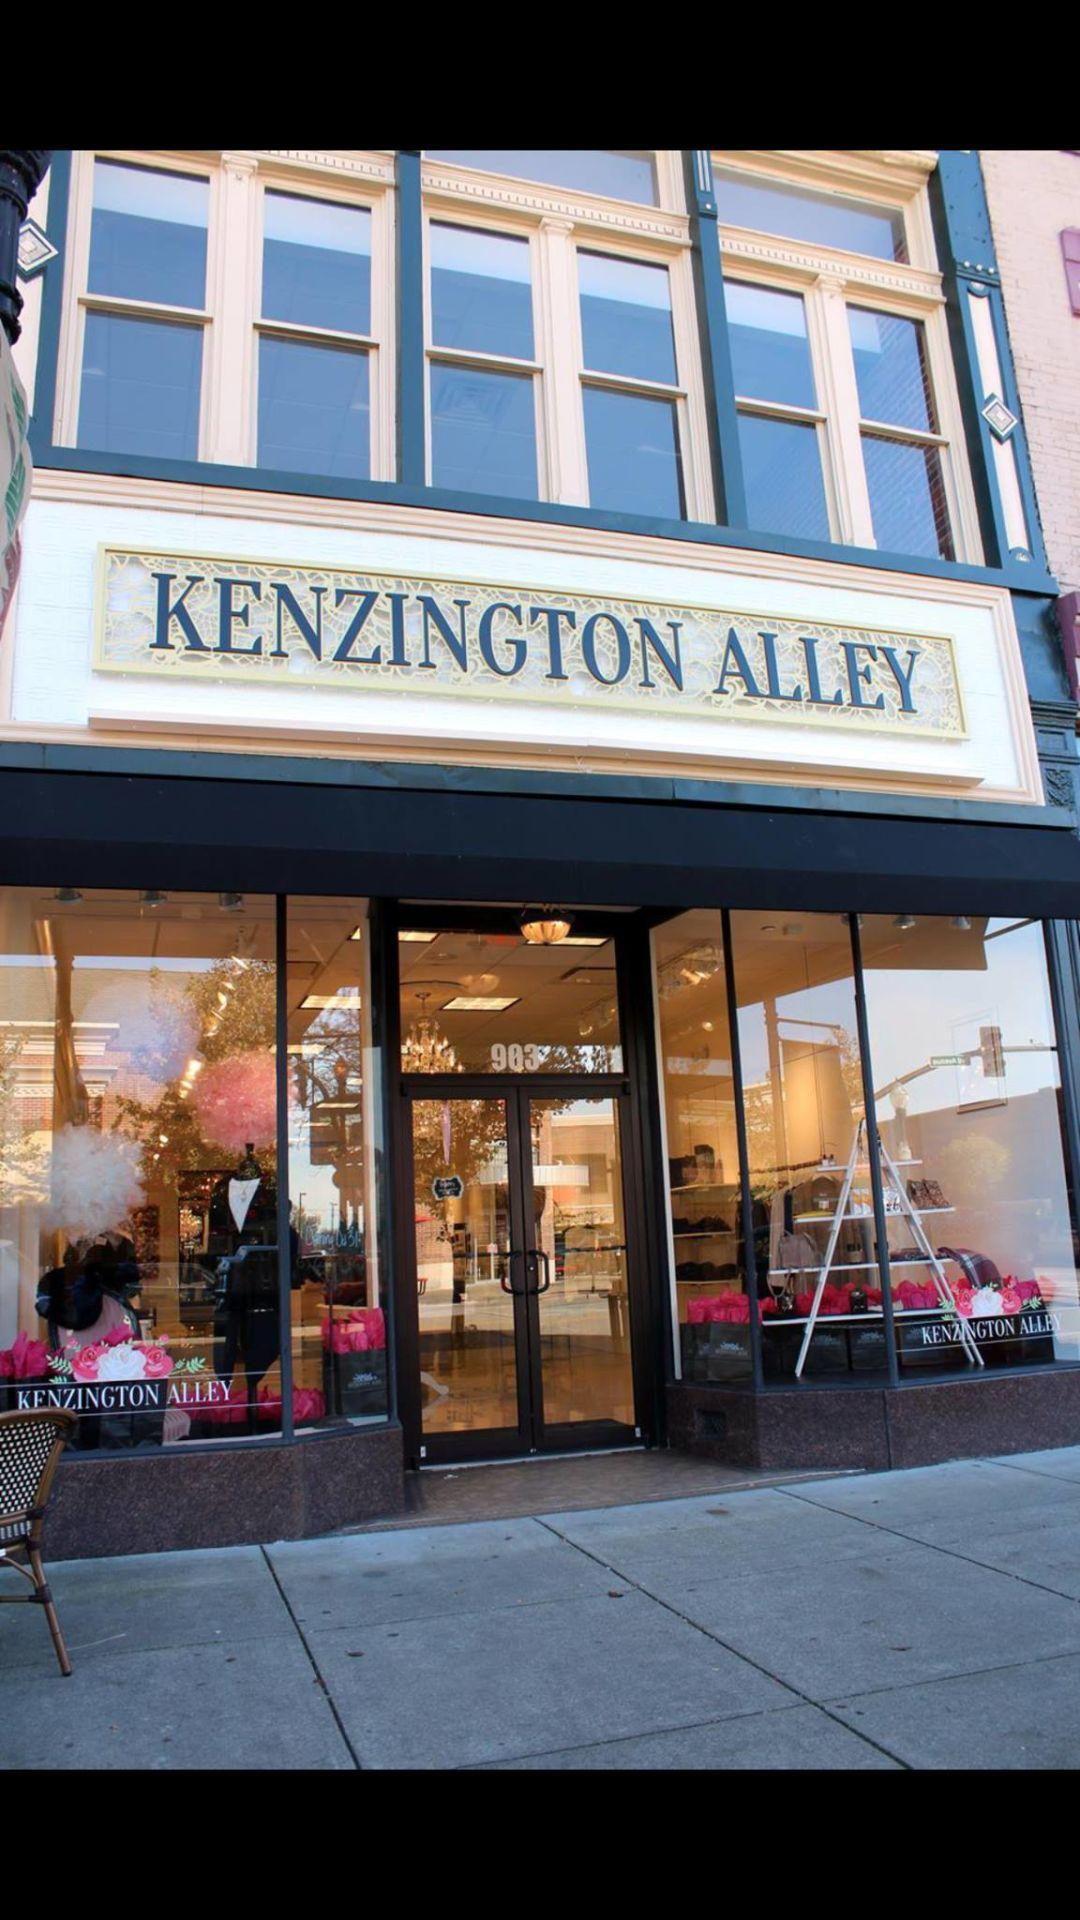 Kenzington Alley store front